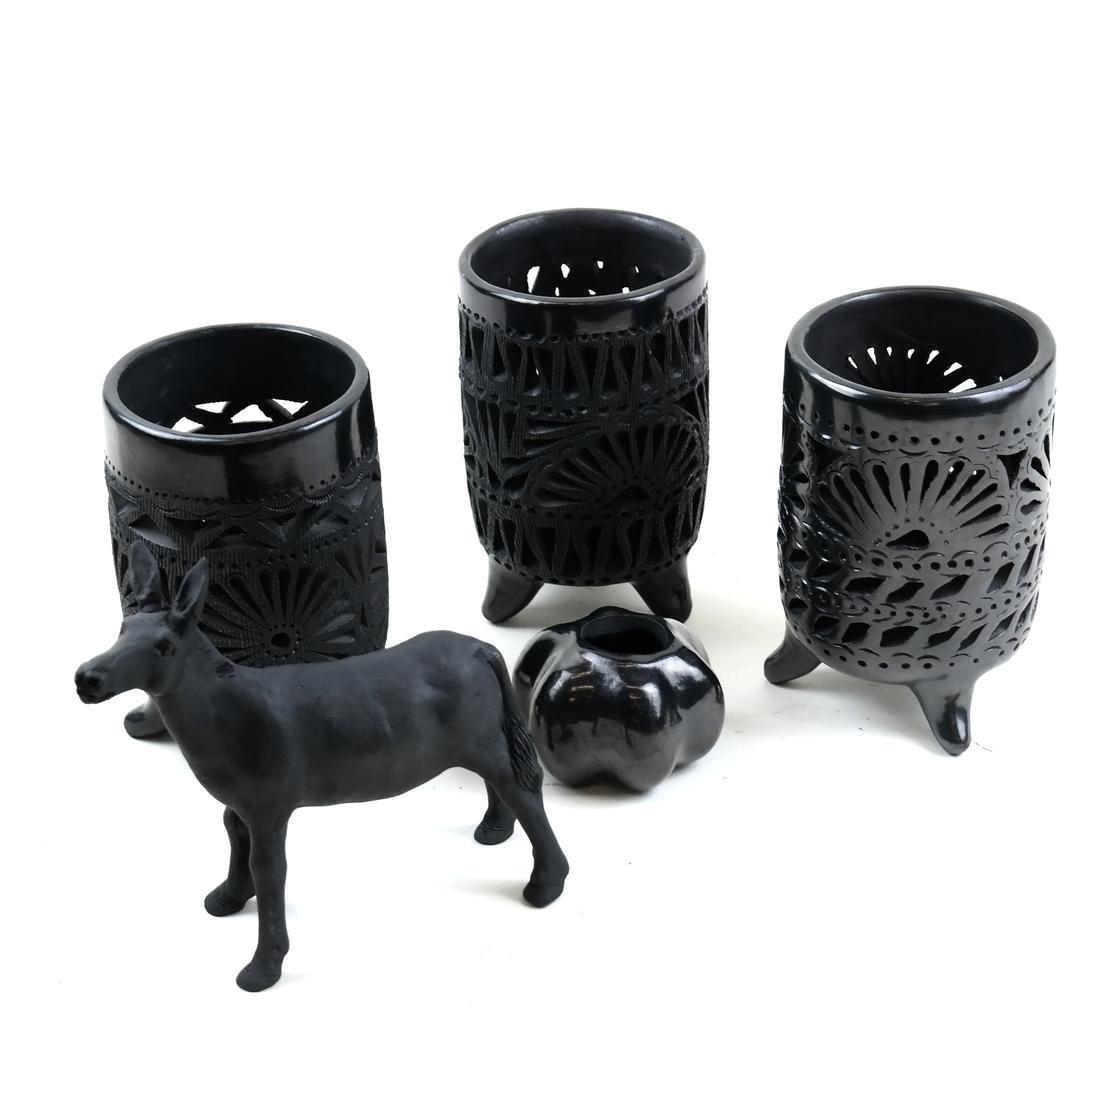 Oaxaca Ceramic Decorative Objects